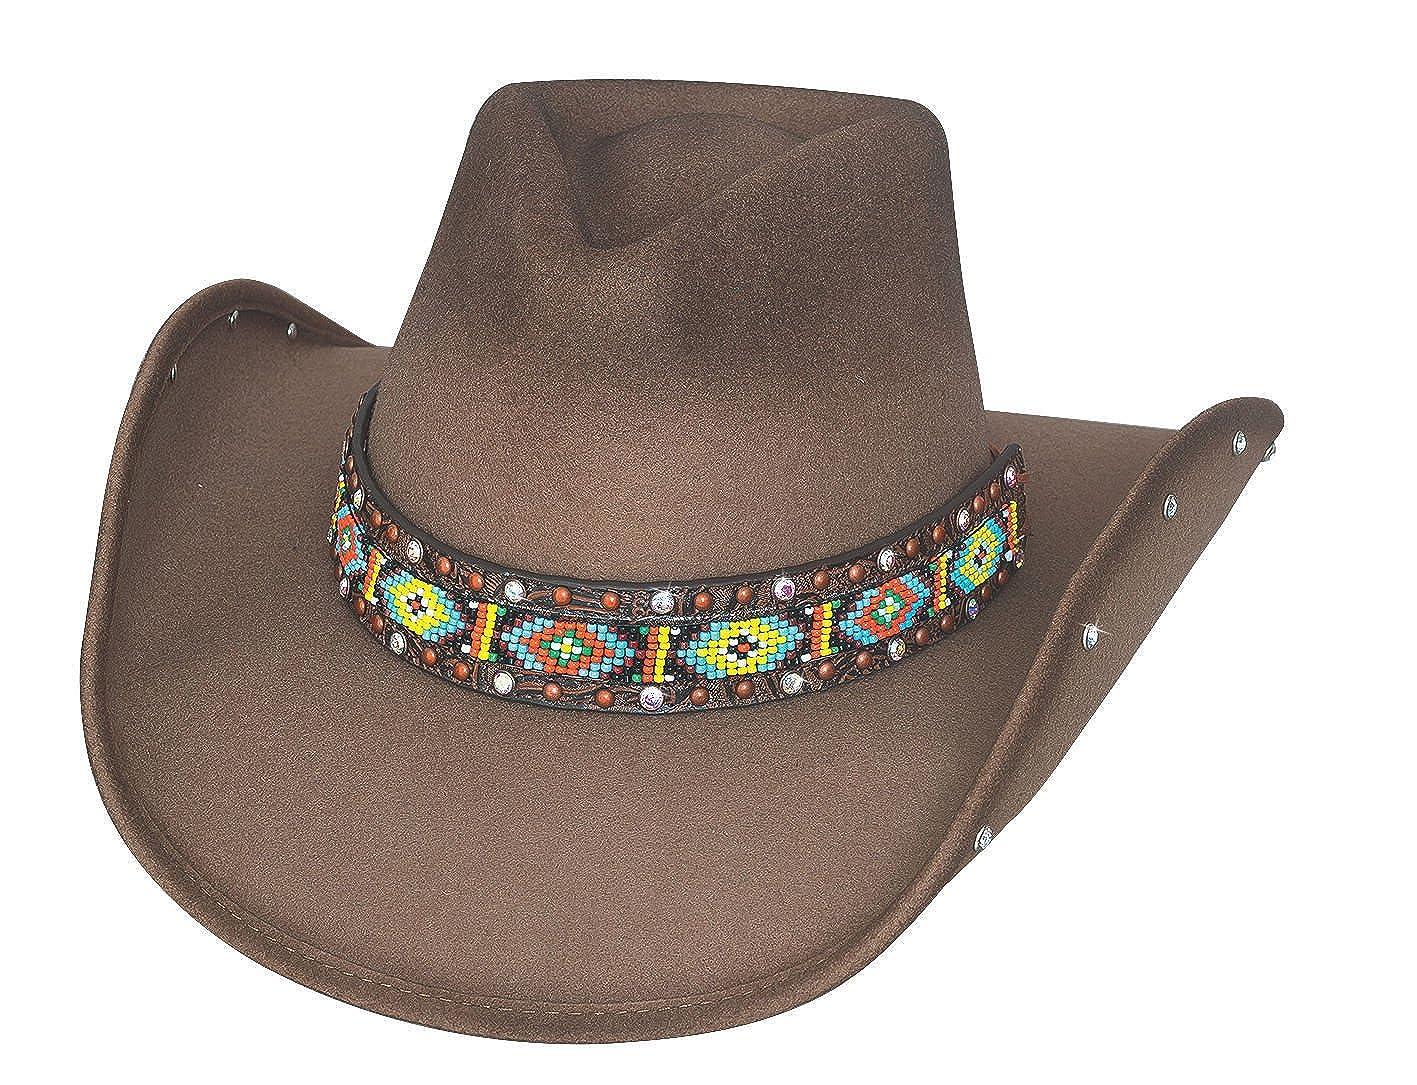 718b0aac0 Bullhide Women's Hats Bad Axe River Wool Felt Cowboy Hat - 0732S at ...